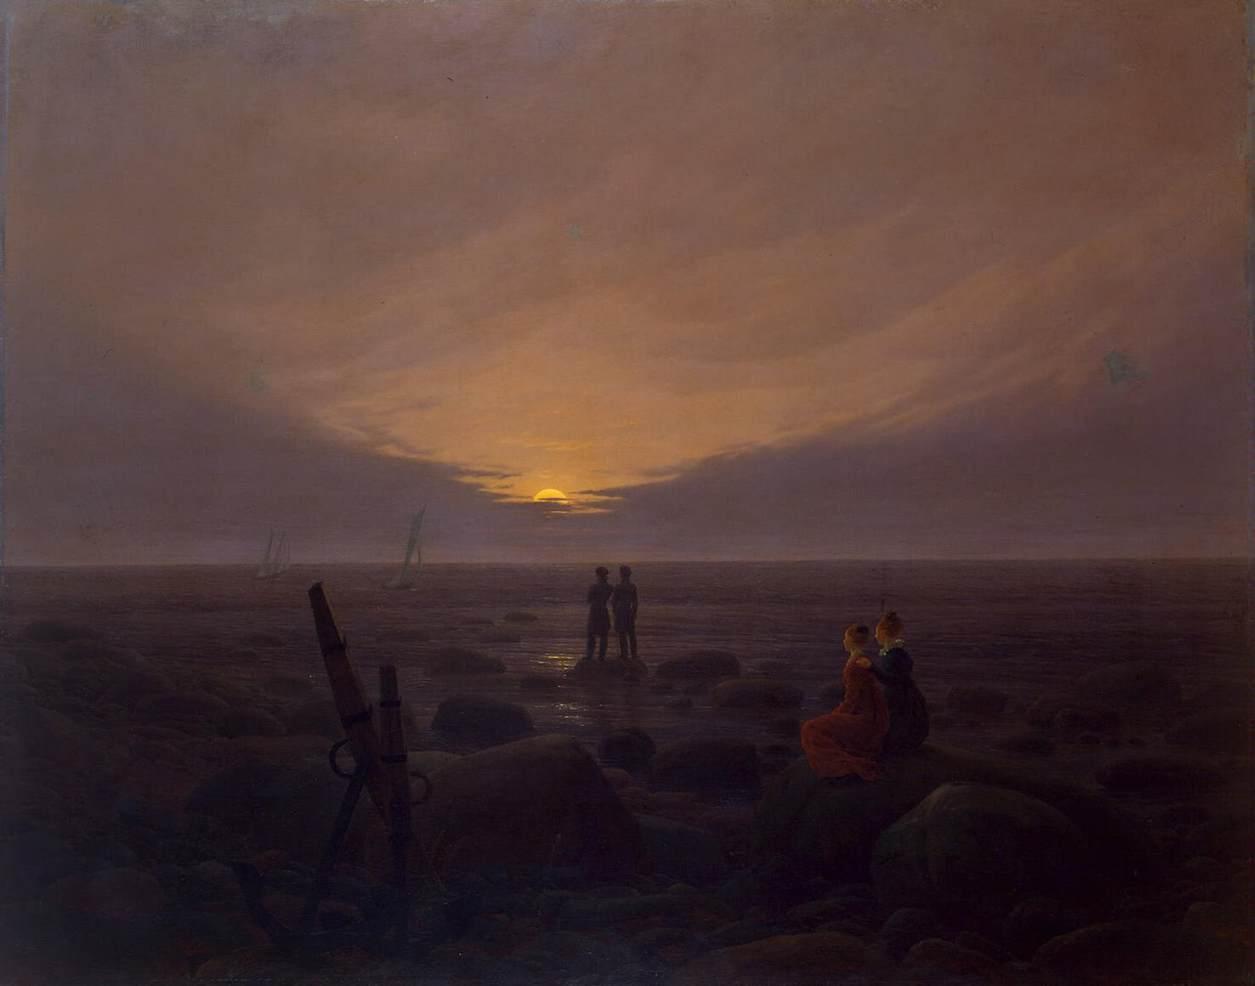 Moon Rise Chart: Caspar David Friedrich - Moonrise by the Sea - WGA08262.jpg ,Chart